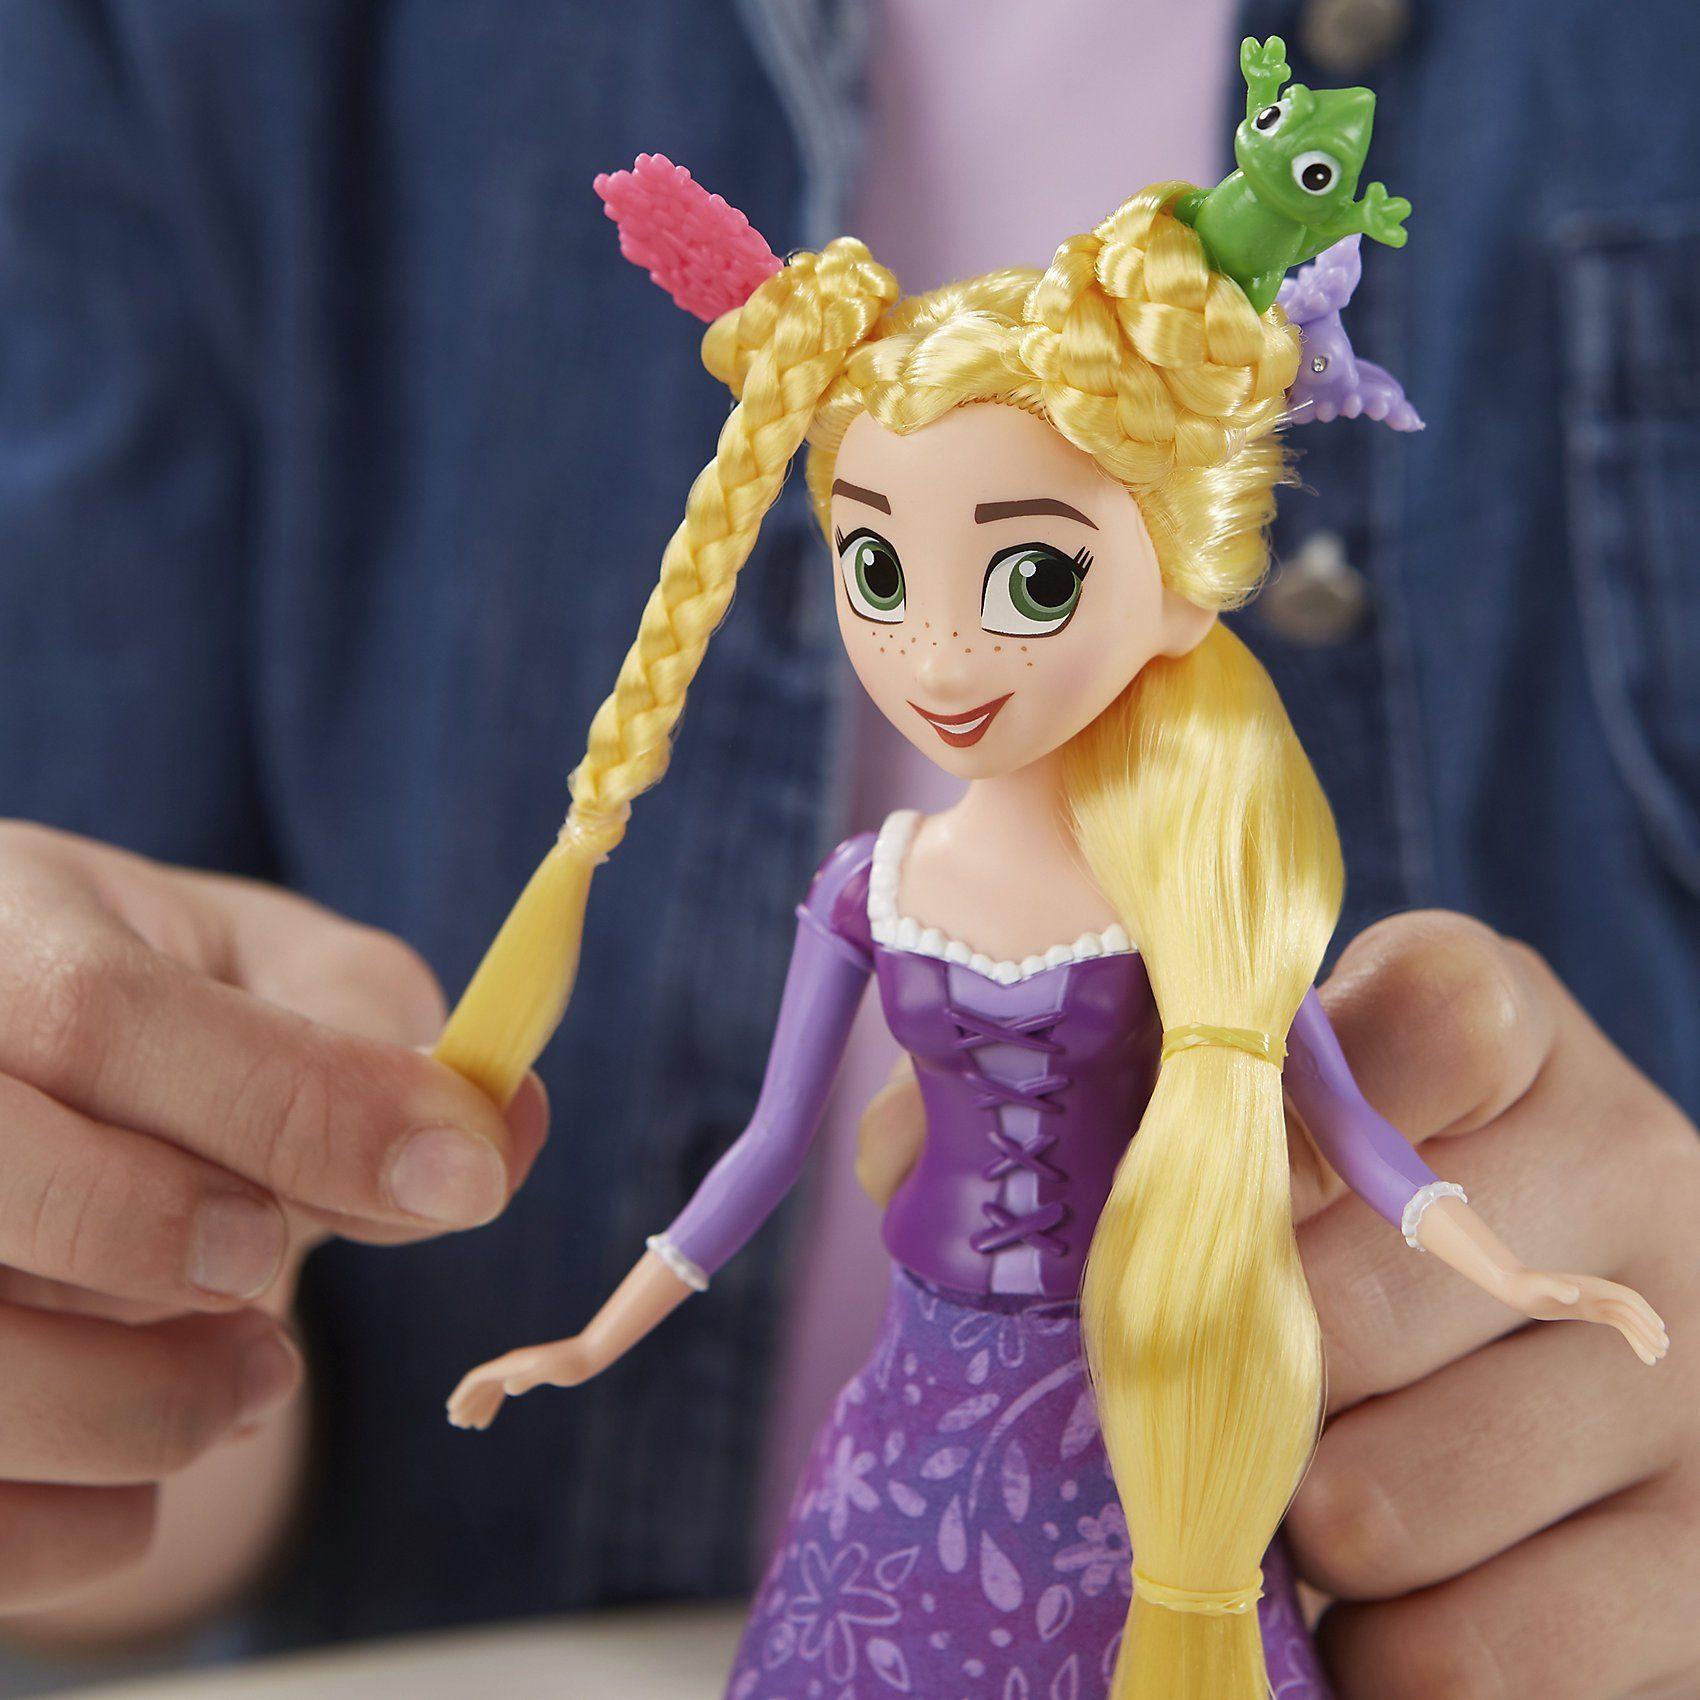 Hasbro Rapunzel: Die Serie Rapunzels durchgedrehter Frisurenspaß